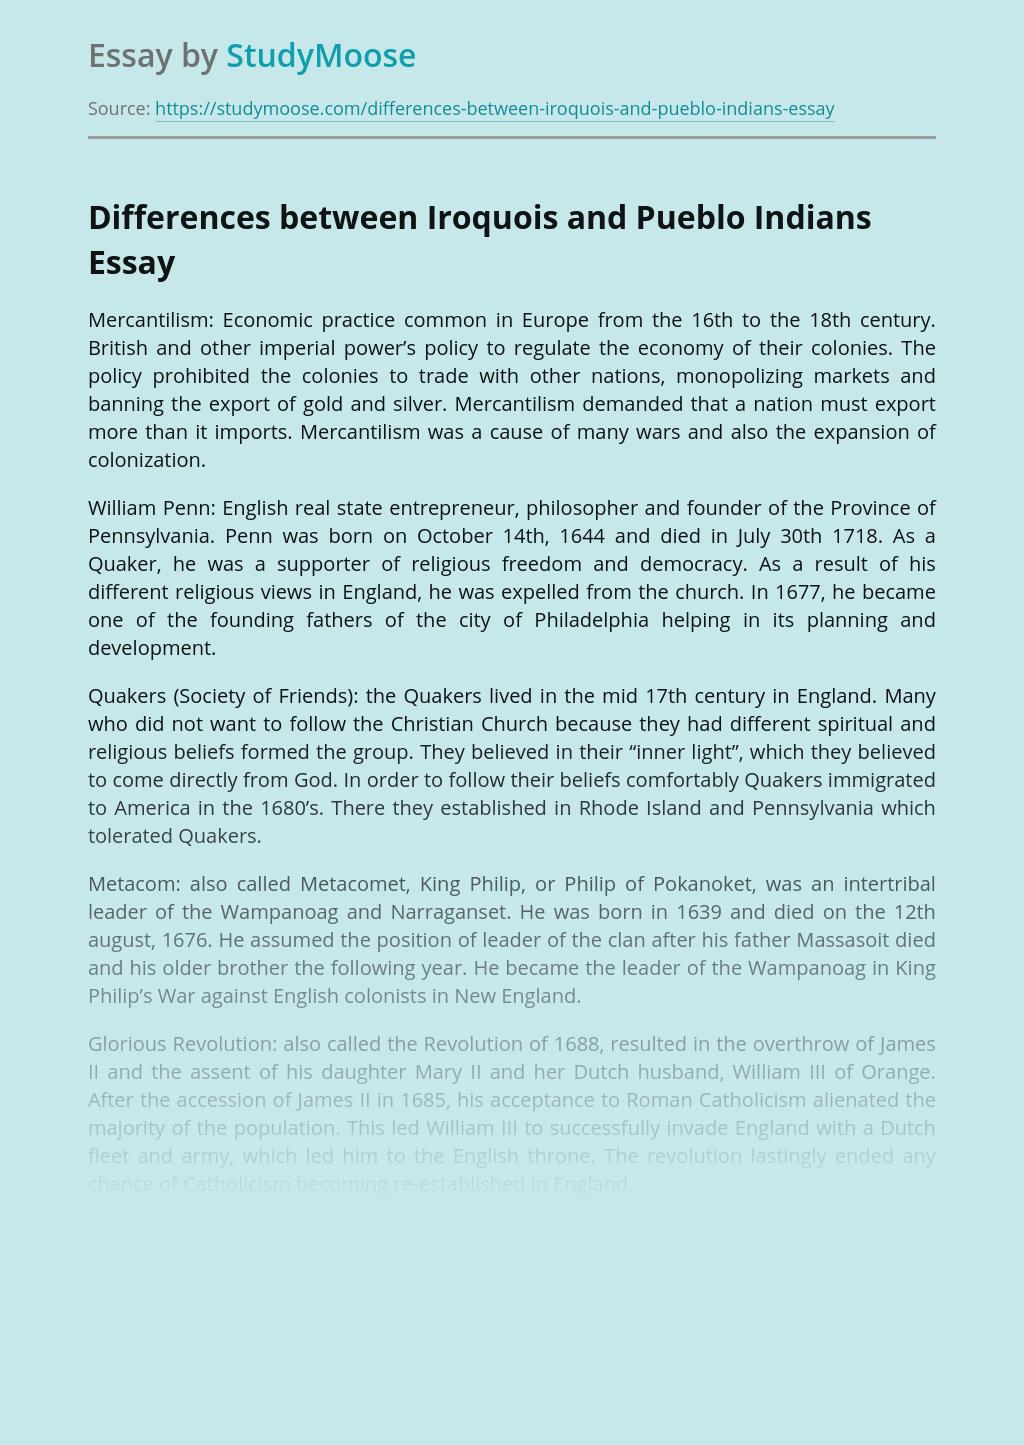 Differences between Iroquois and Pueblo Indians